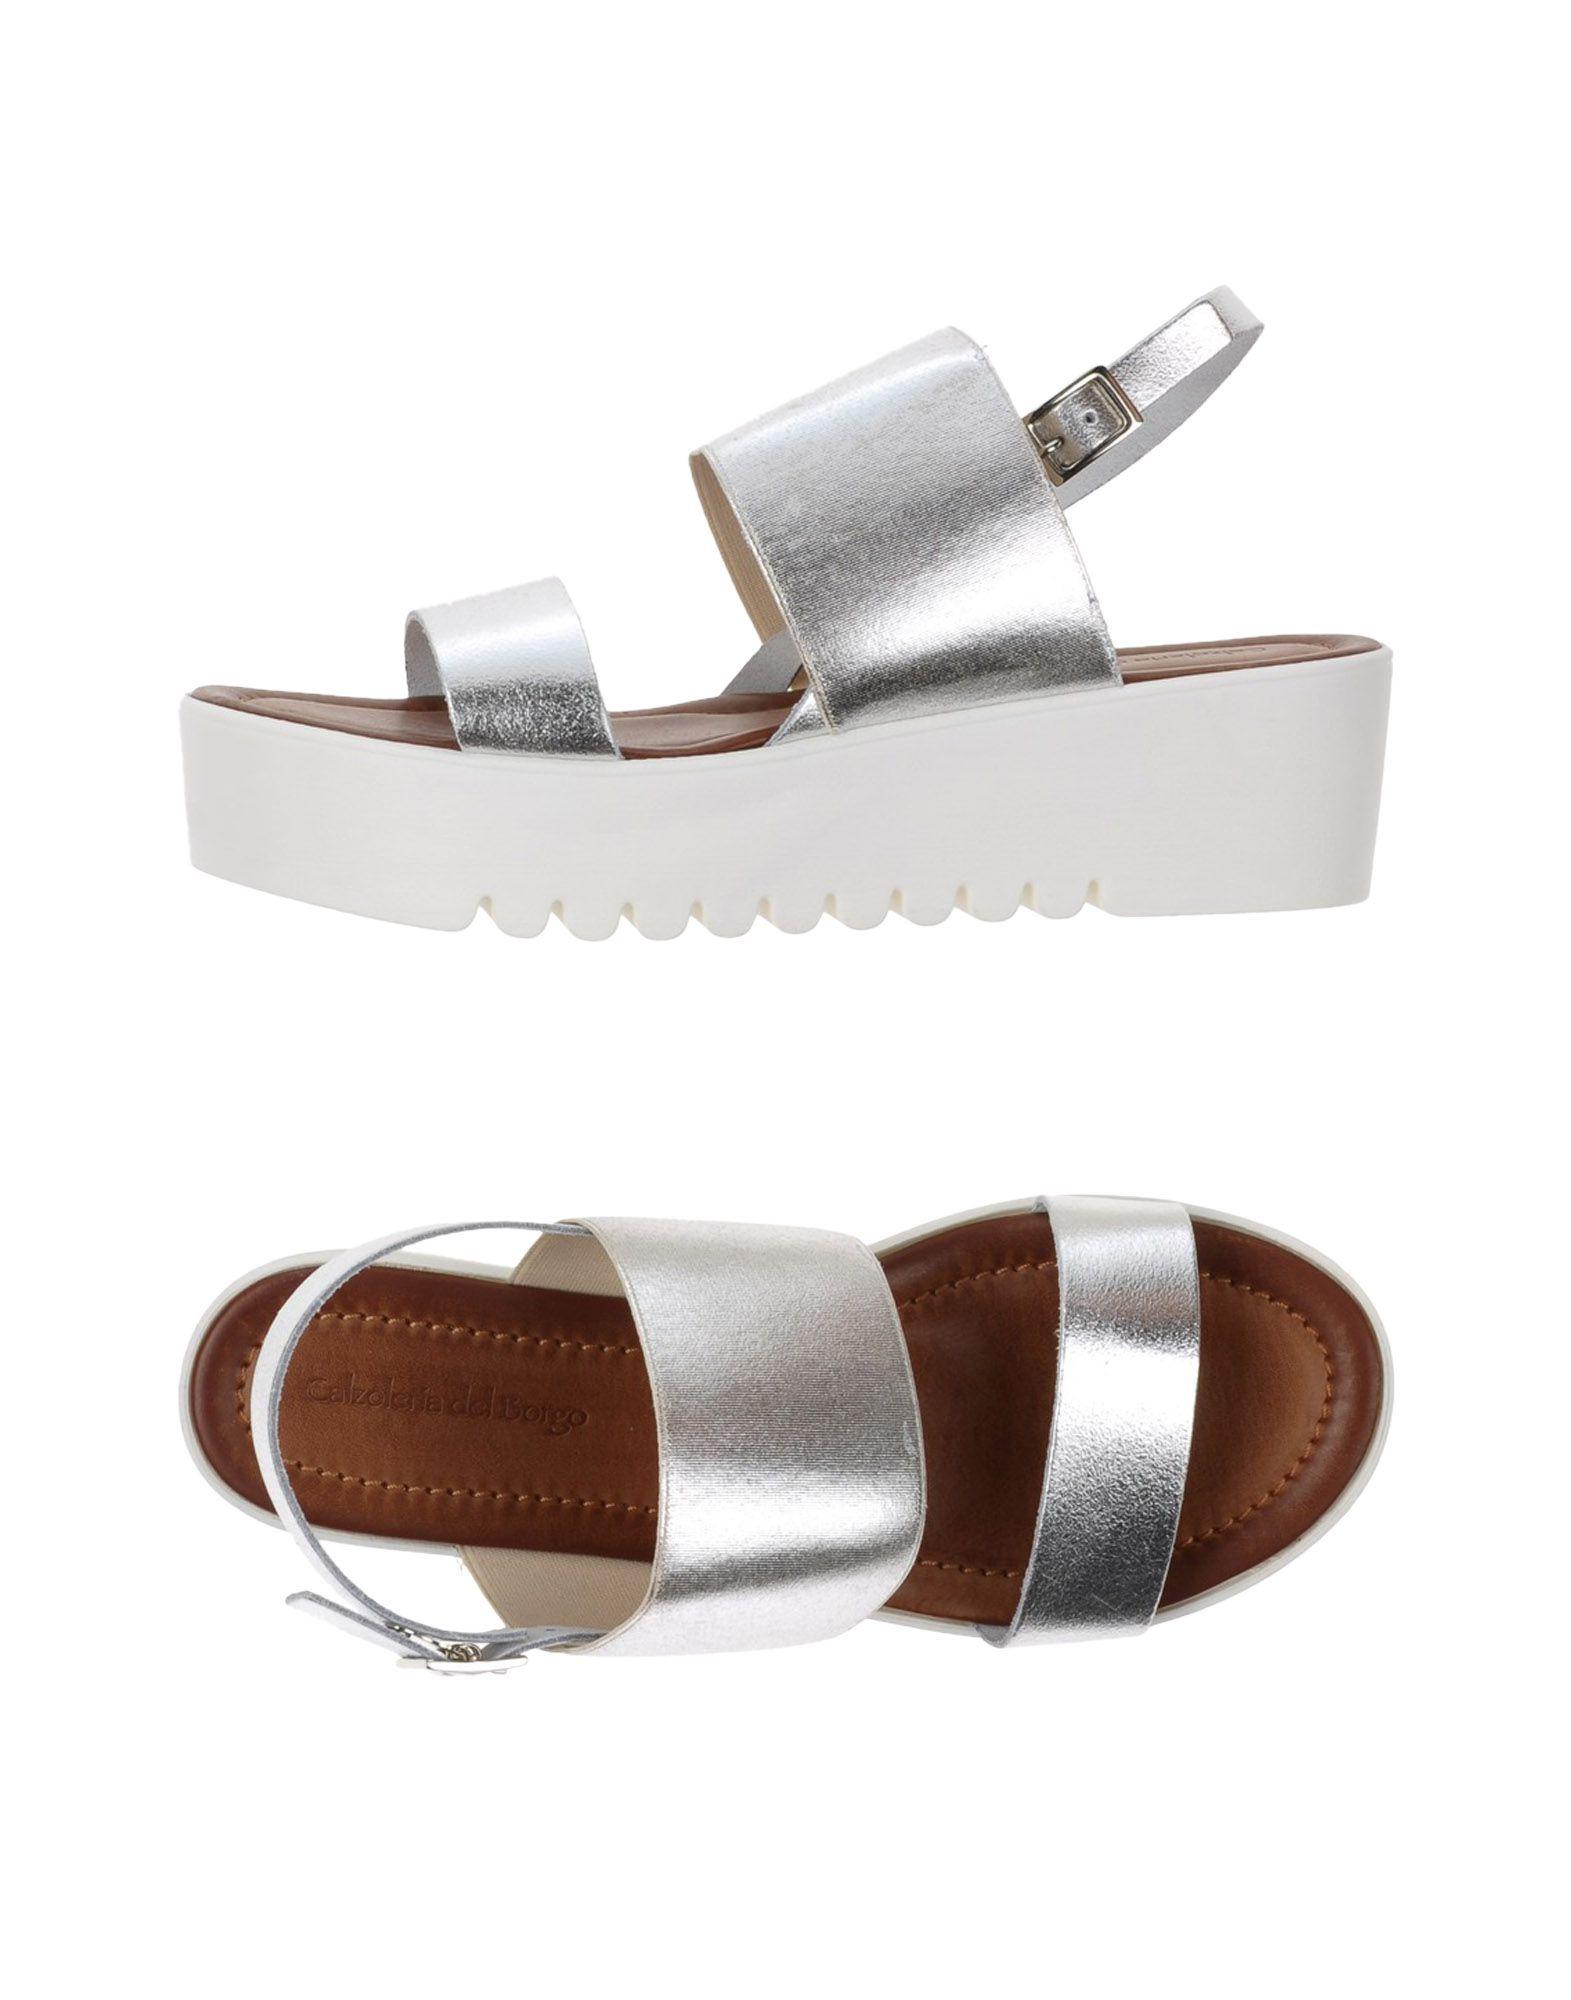 Calzoleria Del Borgo Sandalen Damen  11360304NB Gute Qualität beliebte Schuhe